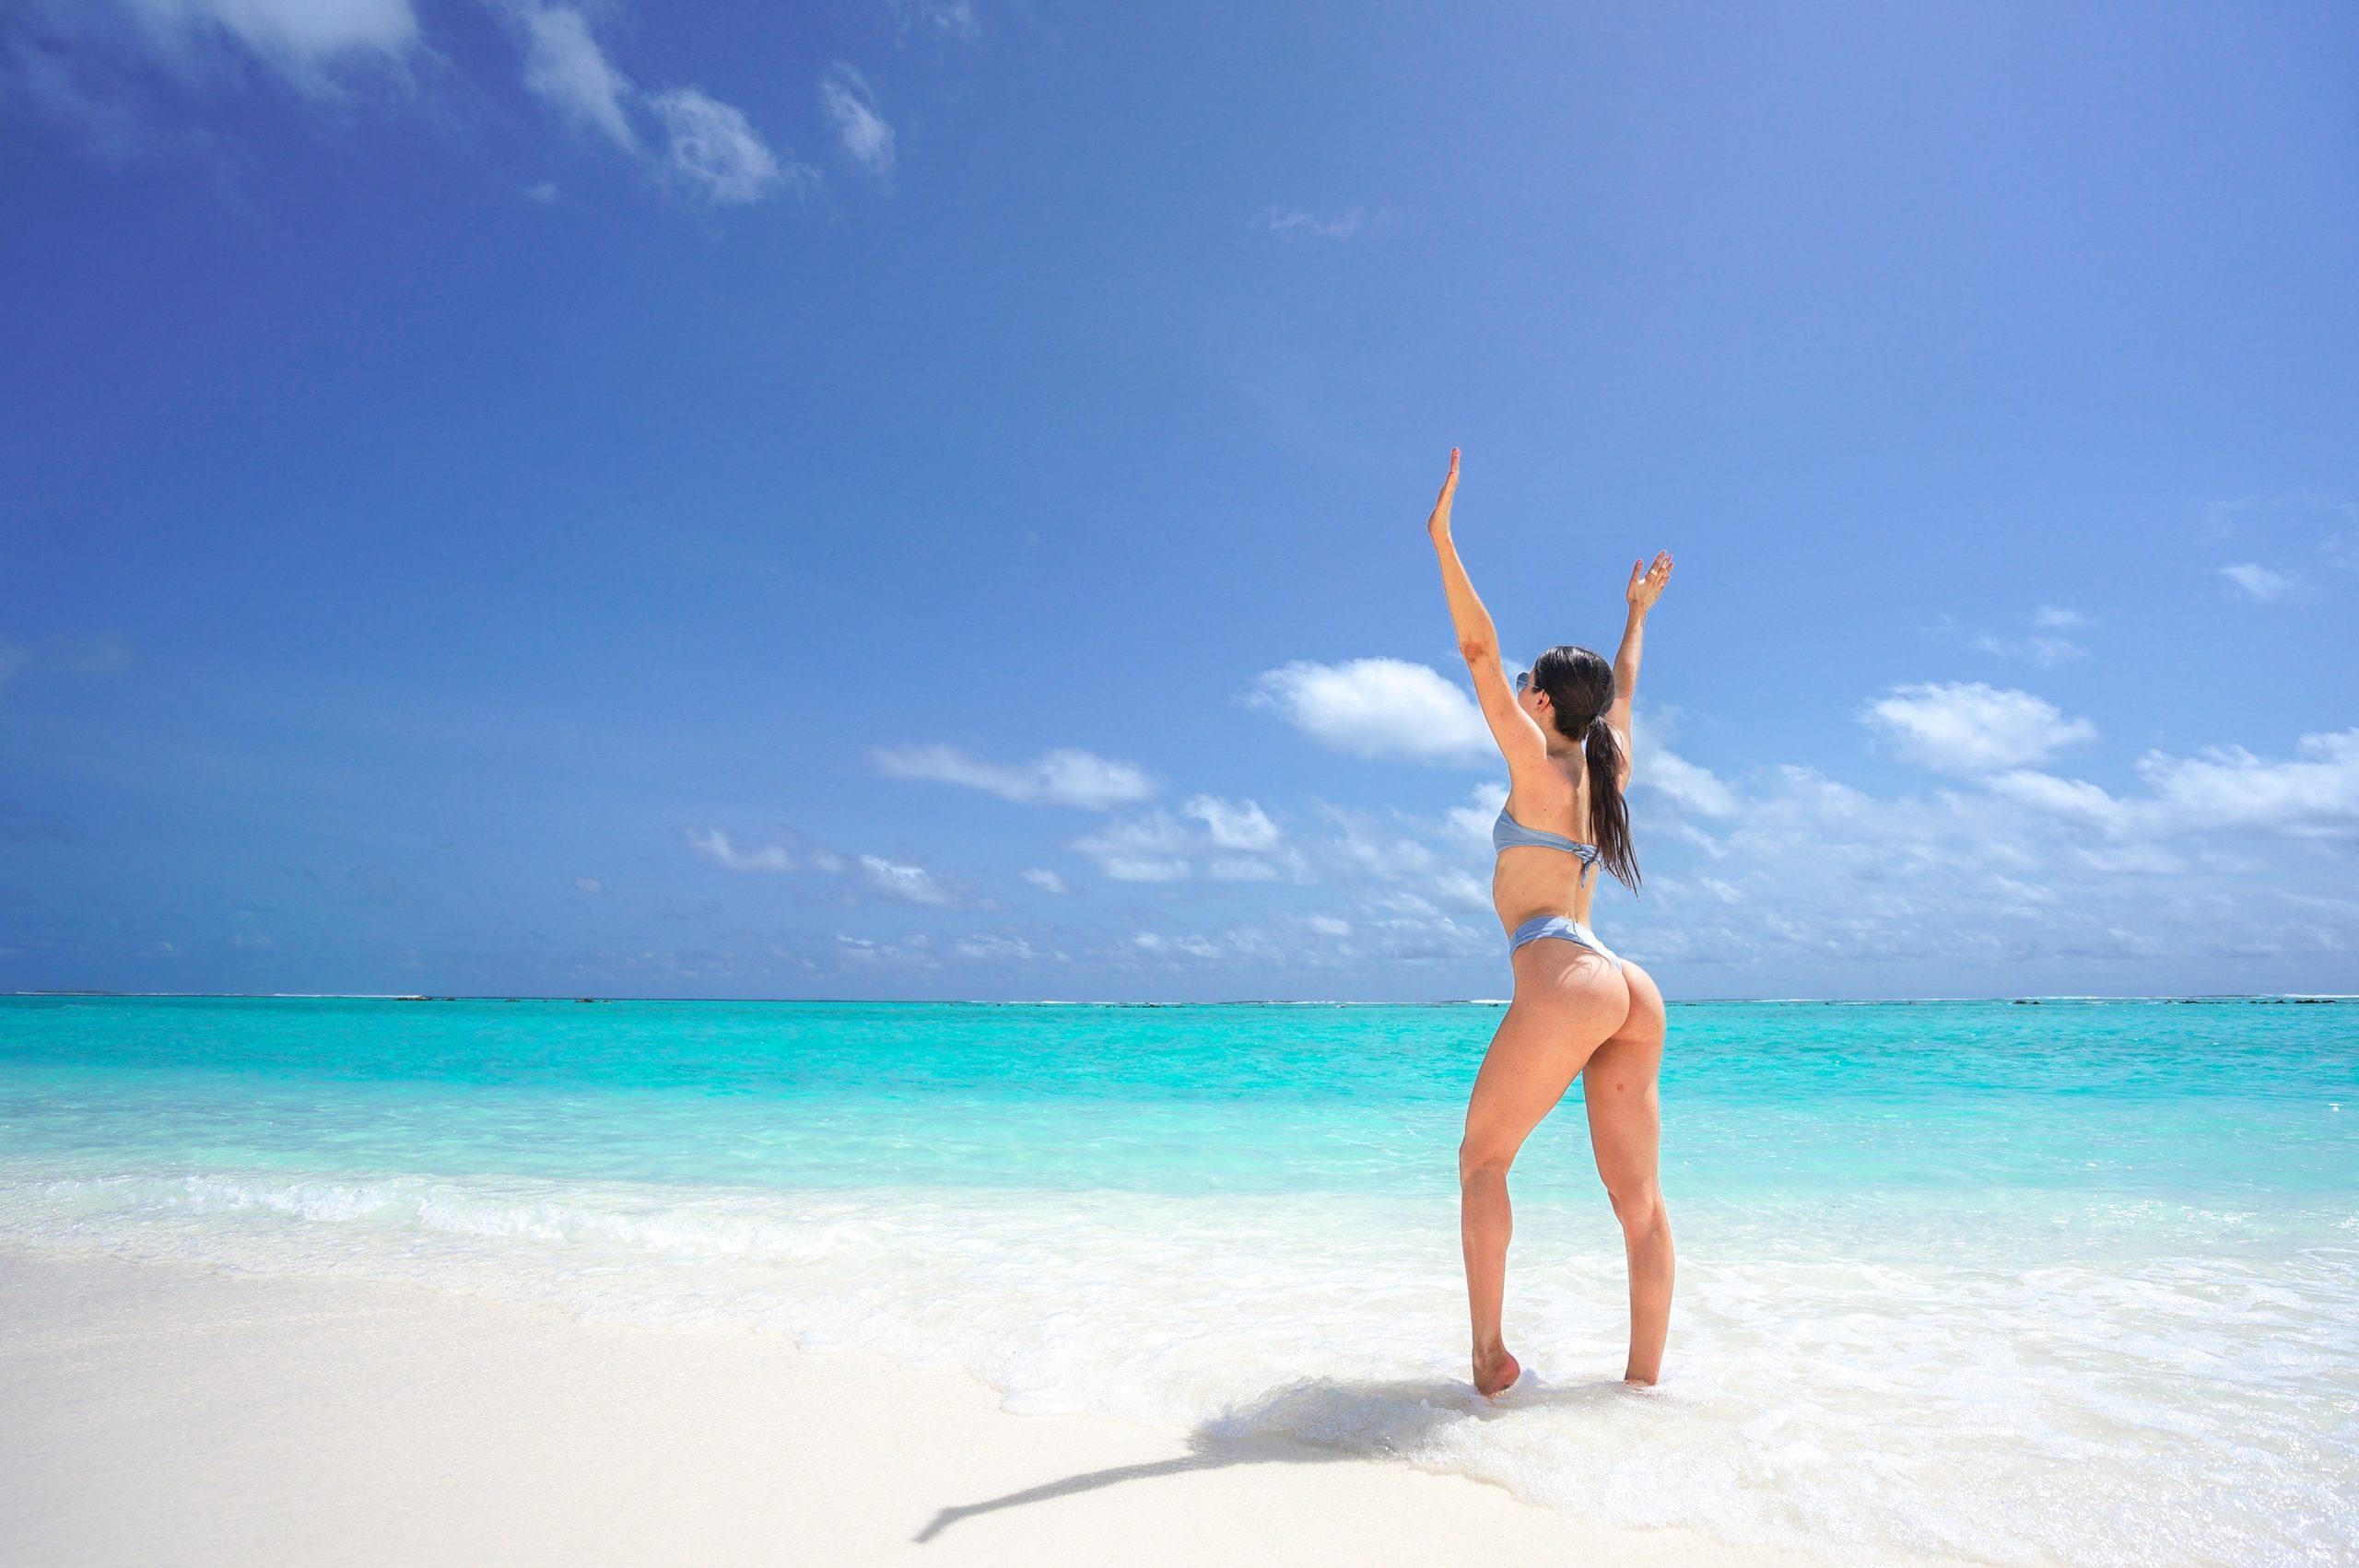 pexels asad photo maldives 3155674 scaled